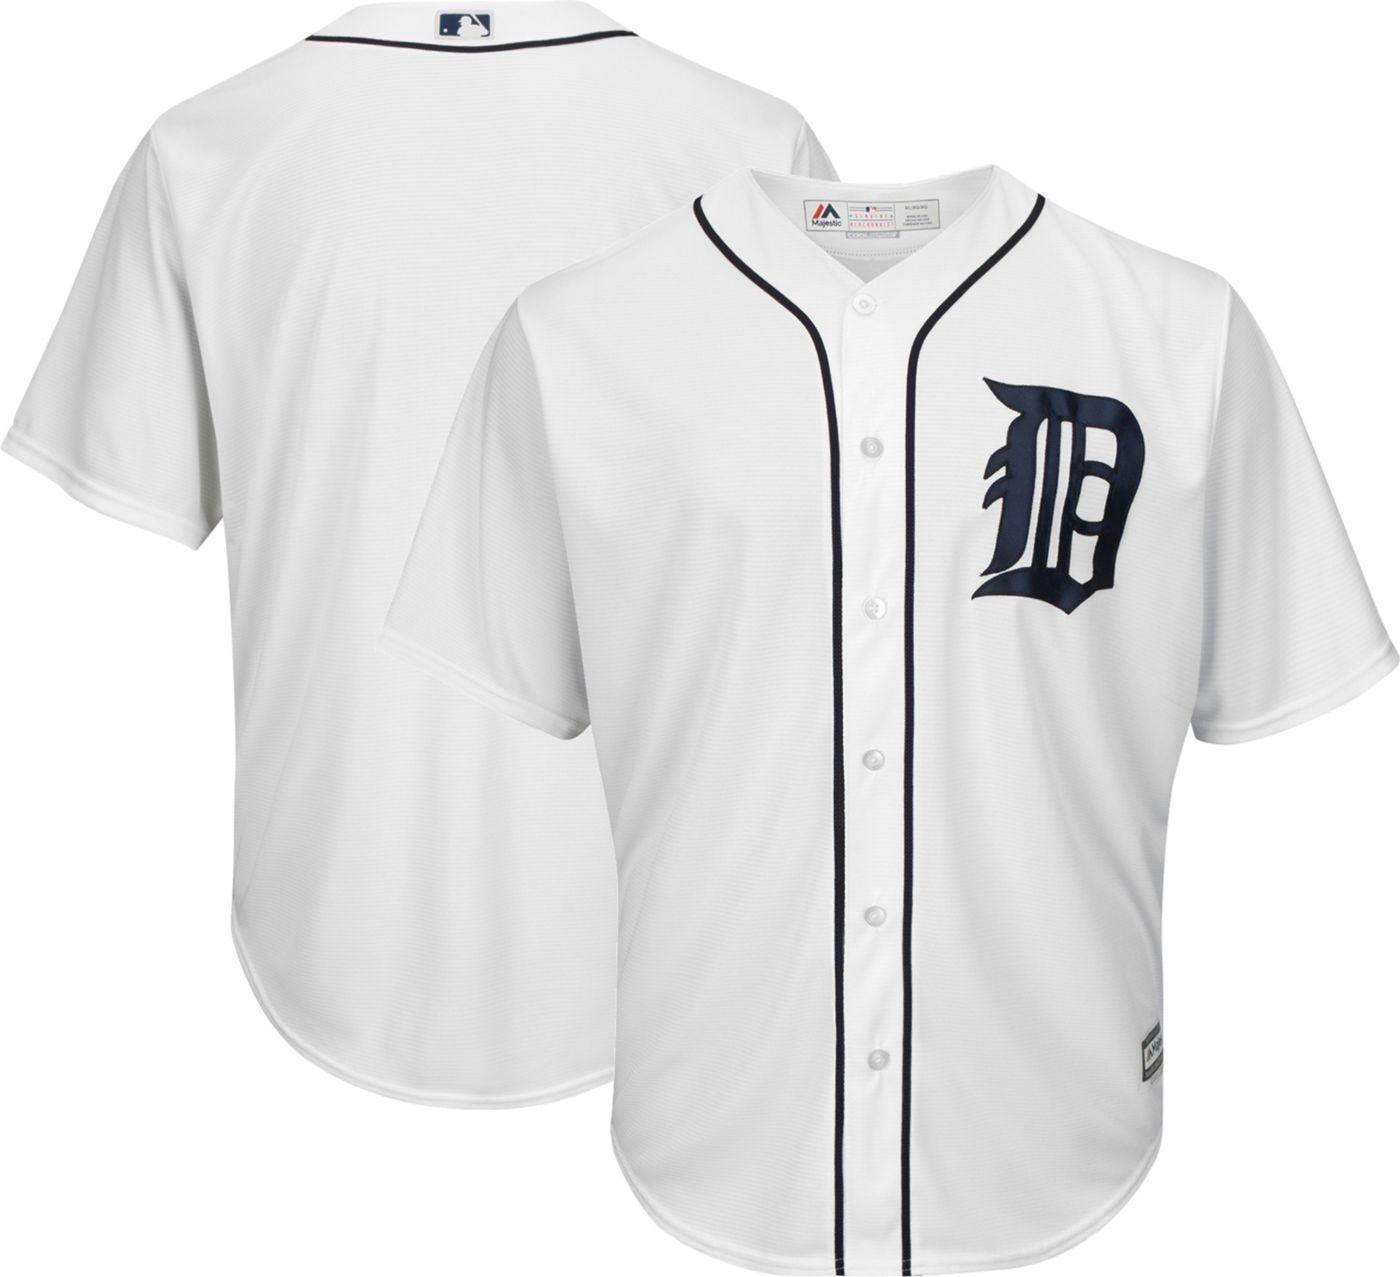 Majestic Boys' Replica Detroit Tigers Cool Base Home White Jersey